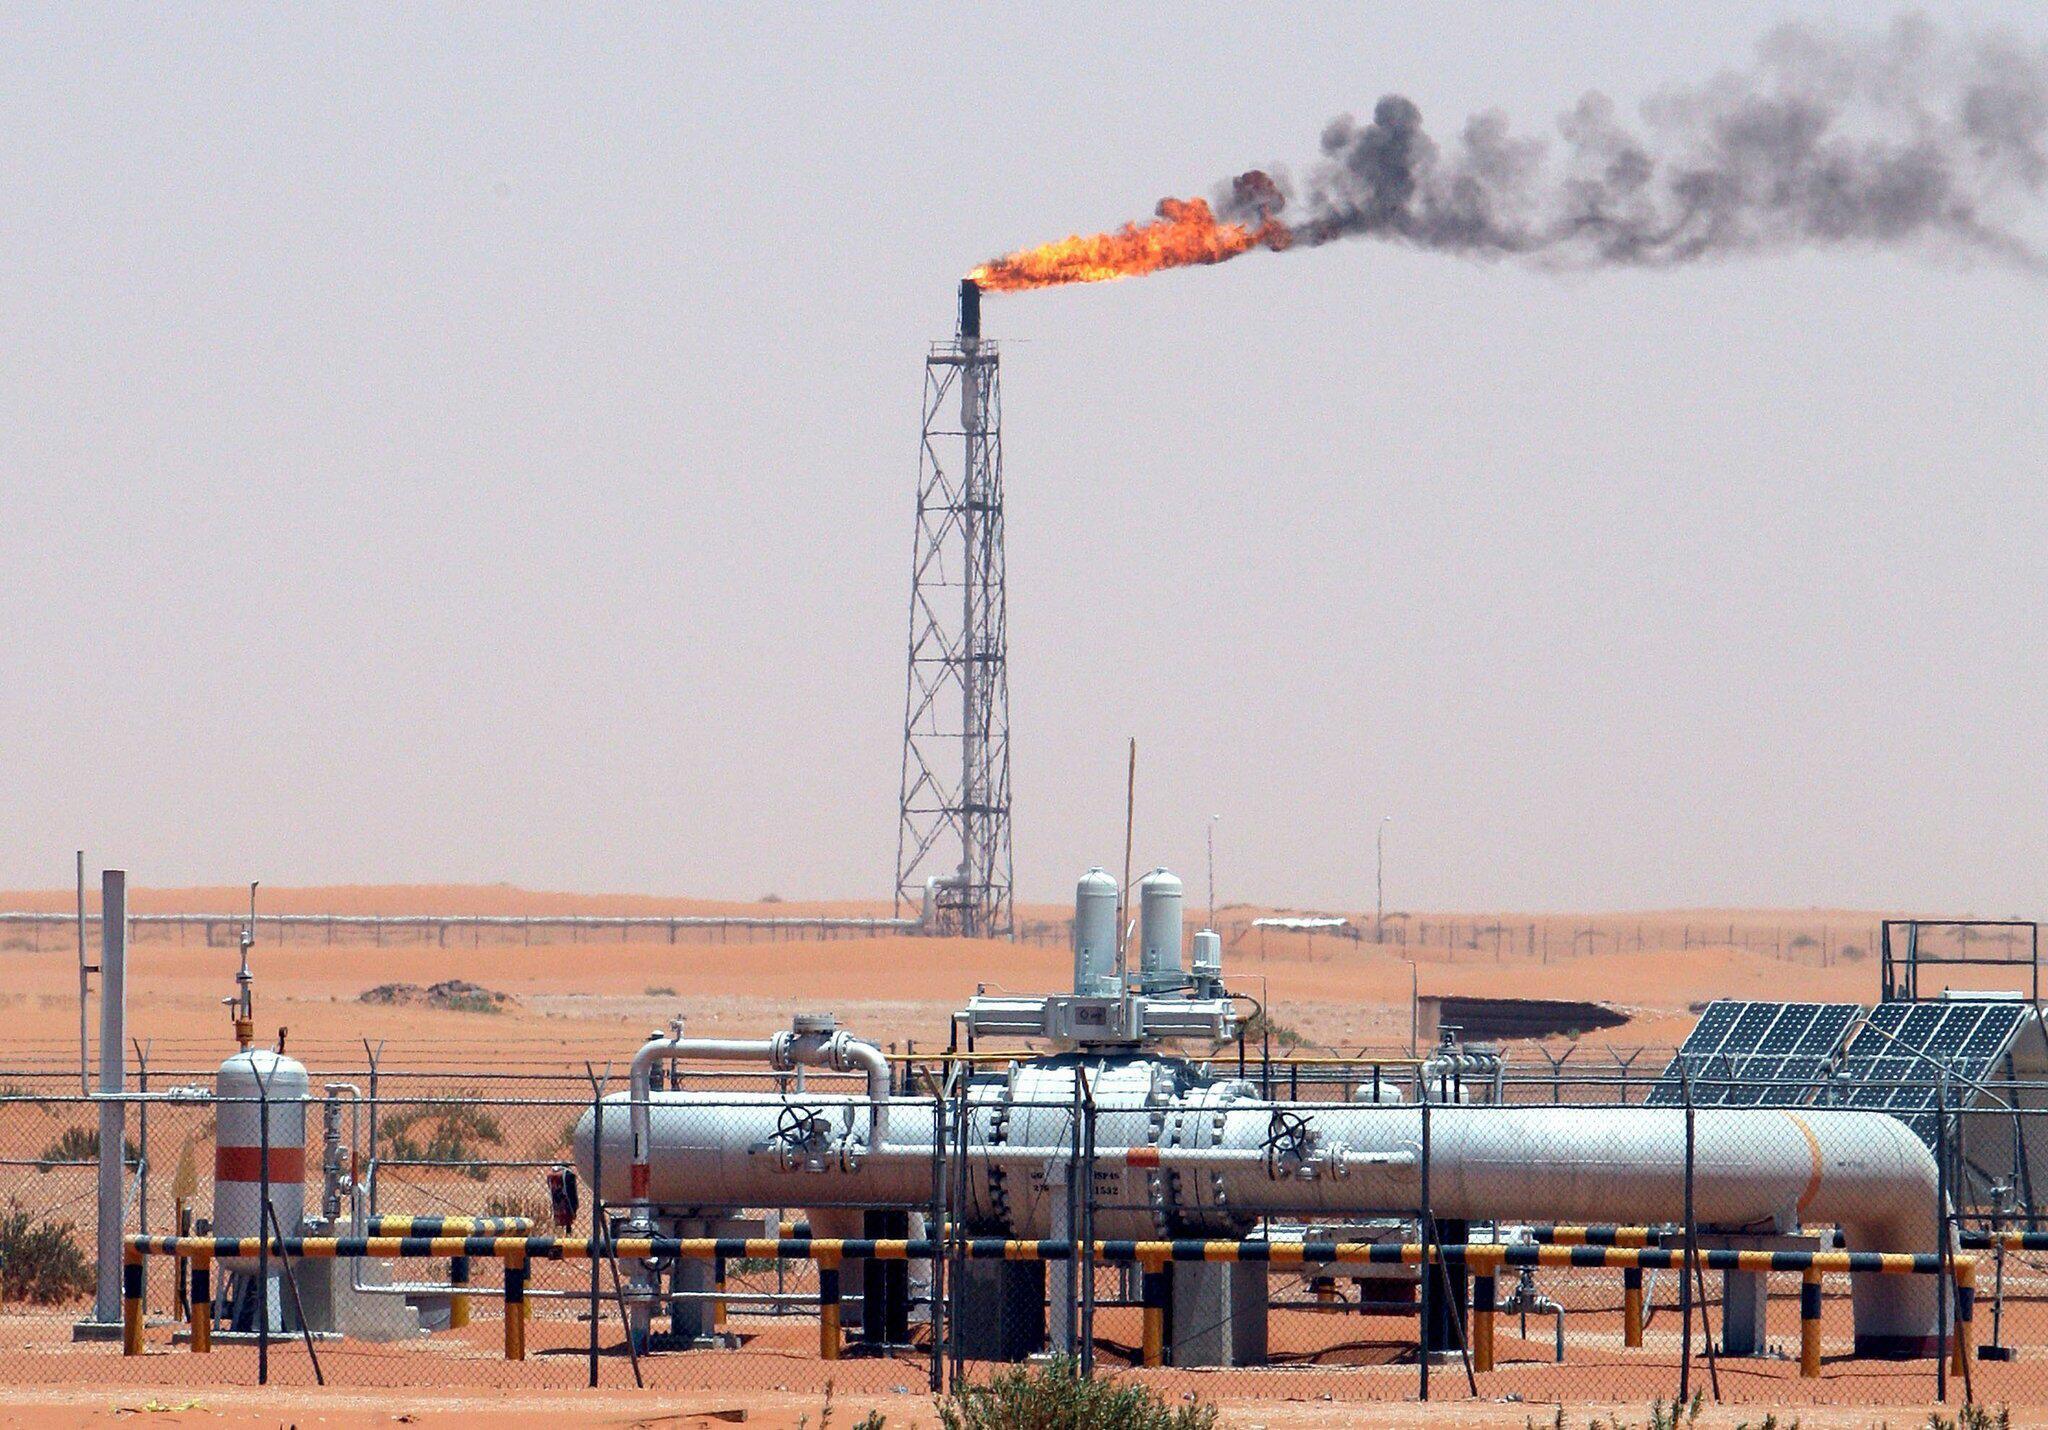 Bild zu Ölförderung in Saudi-Arabien